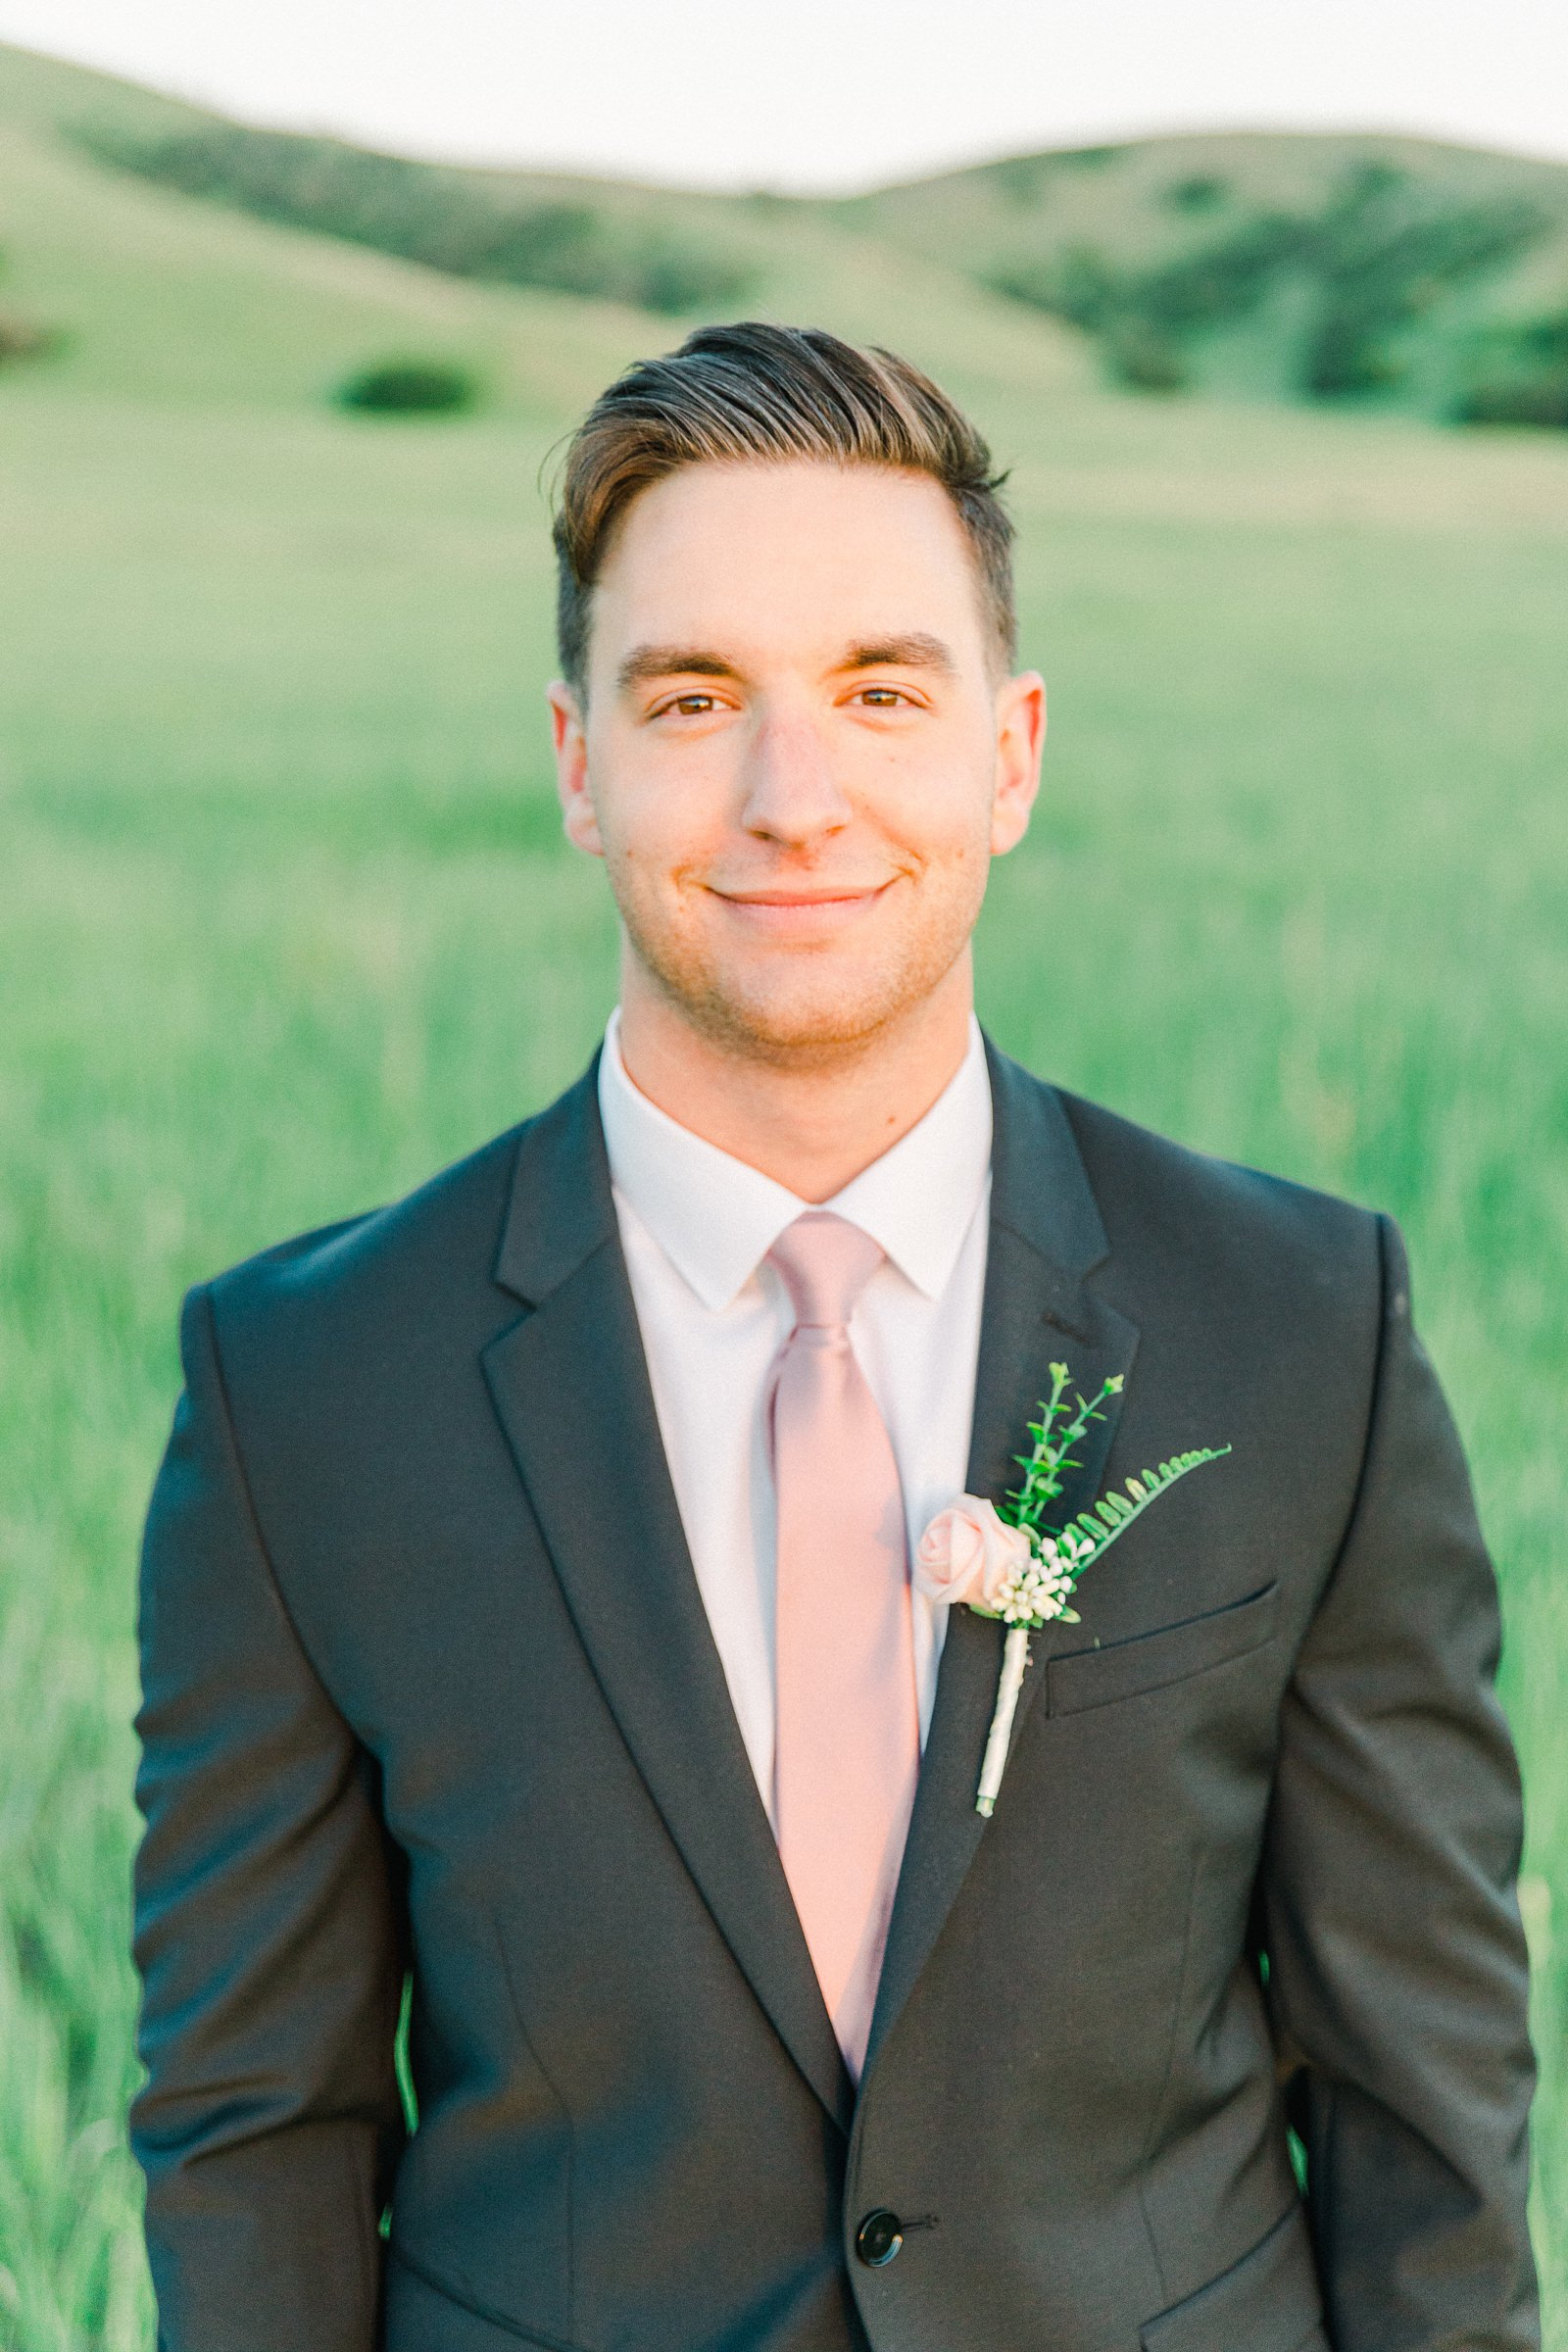 Salt Lake City Utah Bridal Wedding Photography, Tunnel Springs Park, groom in dark gray suit and pink tie, open green field